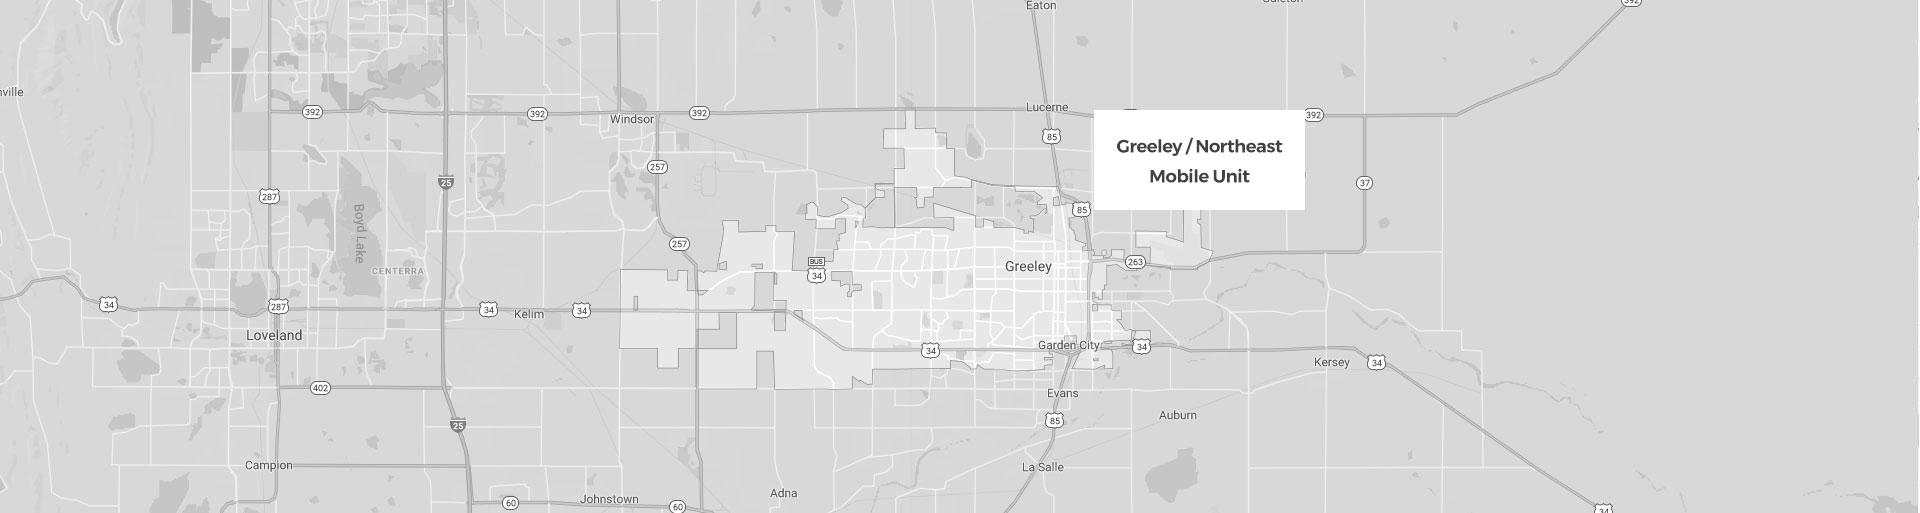 Greeley / Northeast Mobile Unit